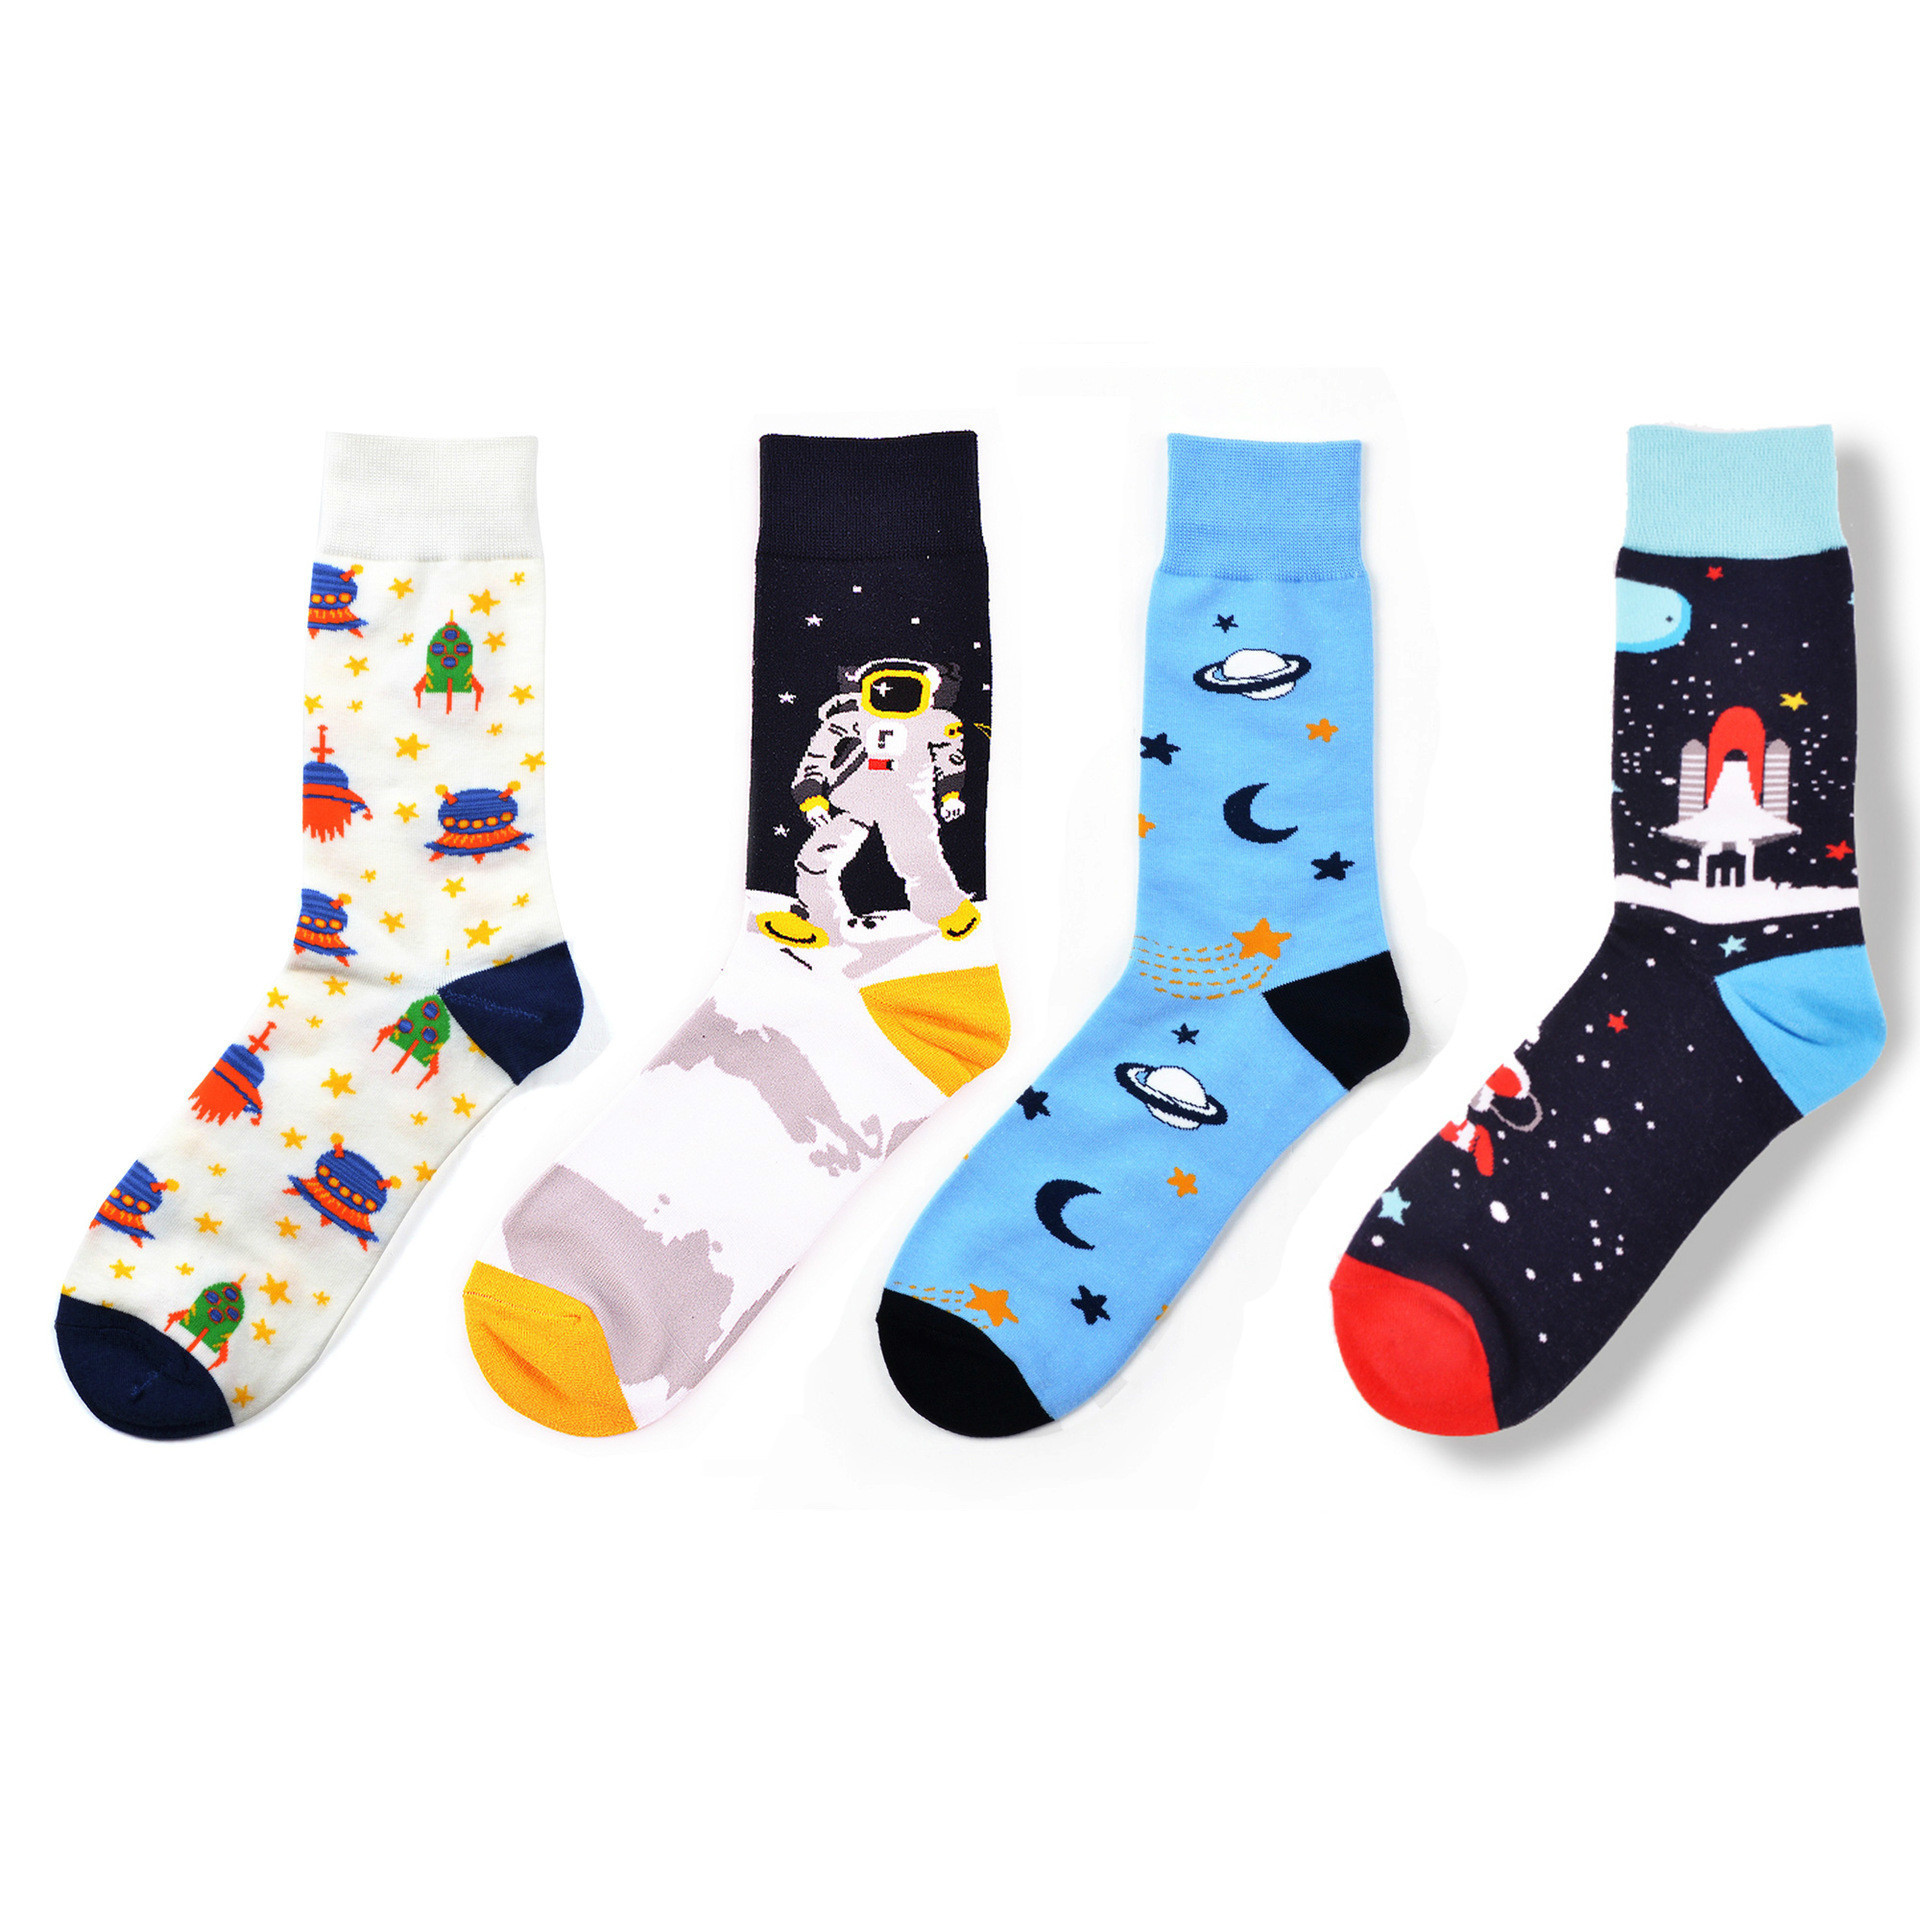 Astronaut Rocket Cosmic Lattice Combed Cotton Crew Sock Casual Men Happy Funny Novelty Male Dress Wedding Harajuku Hip Hop